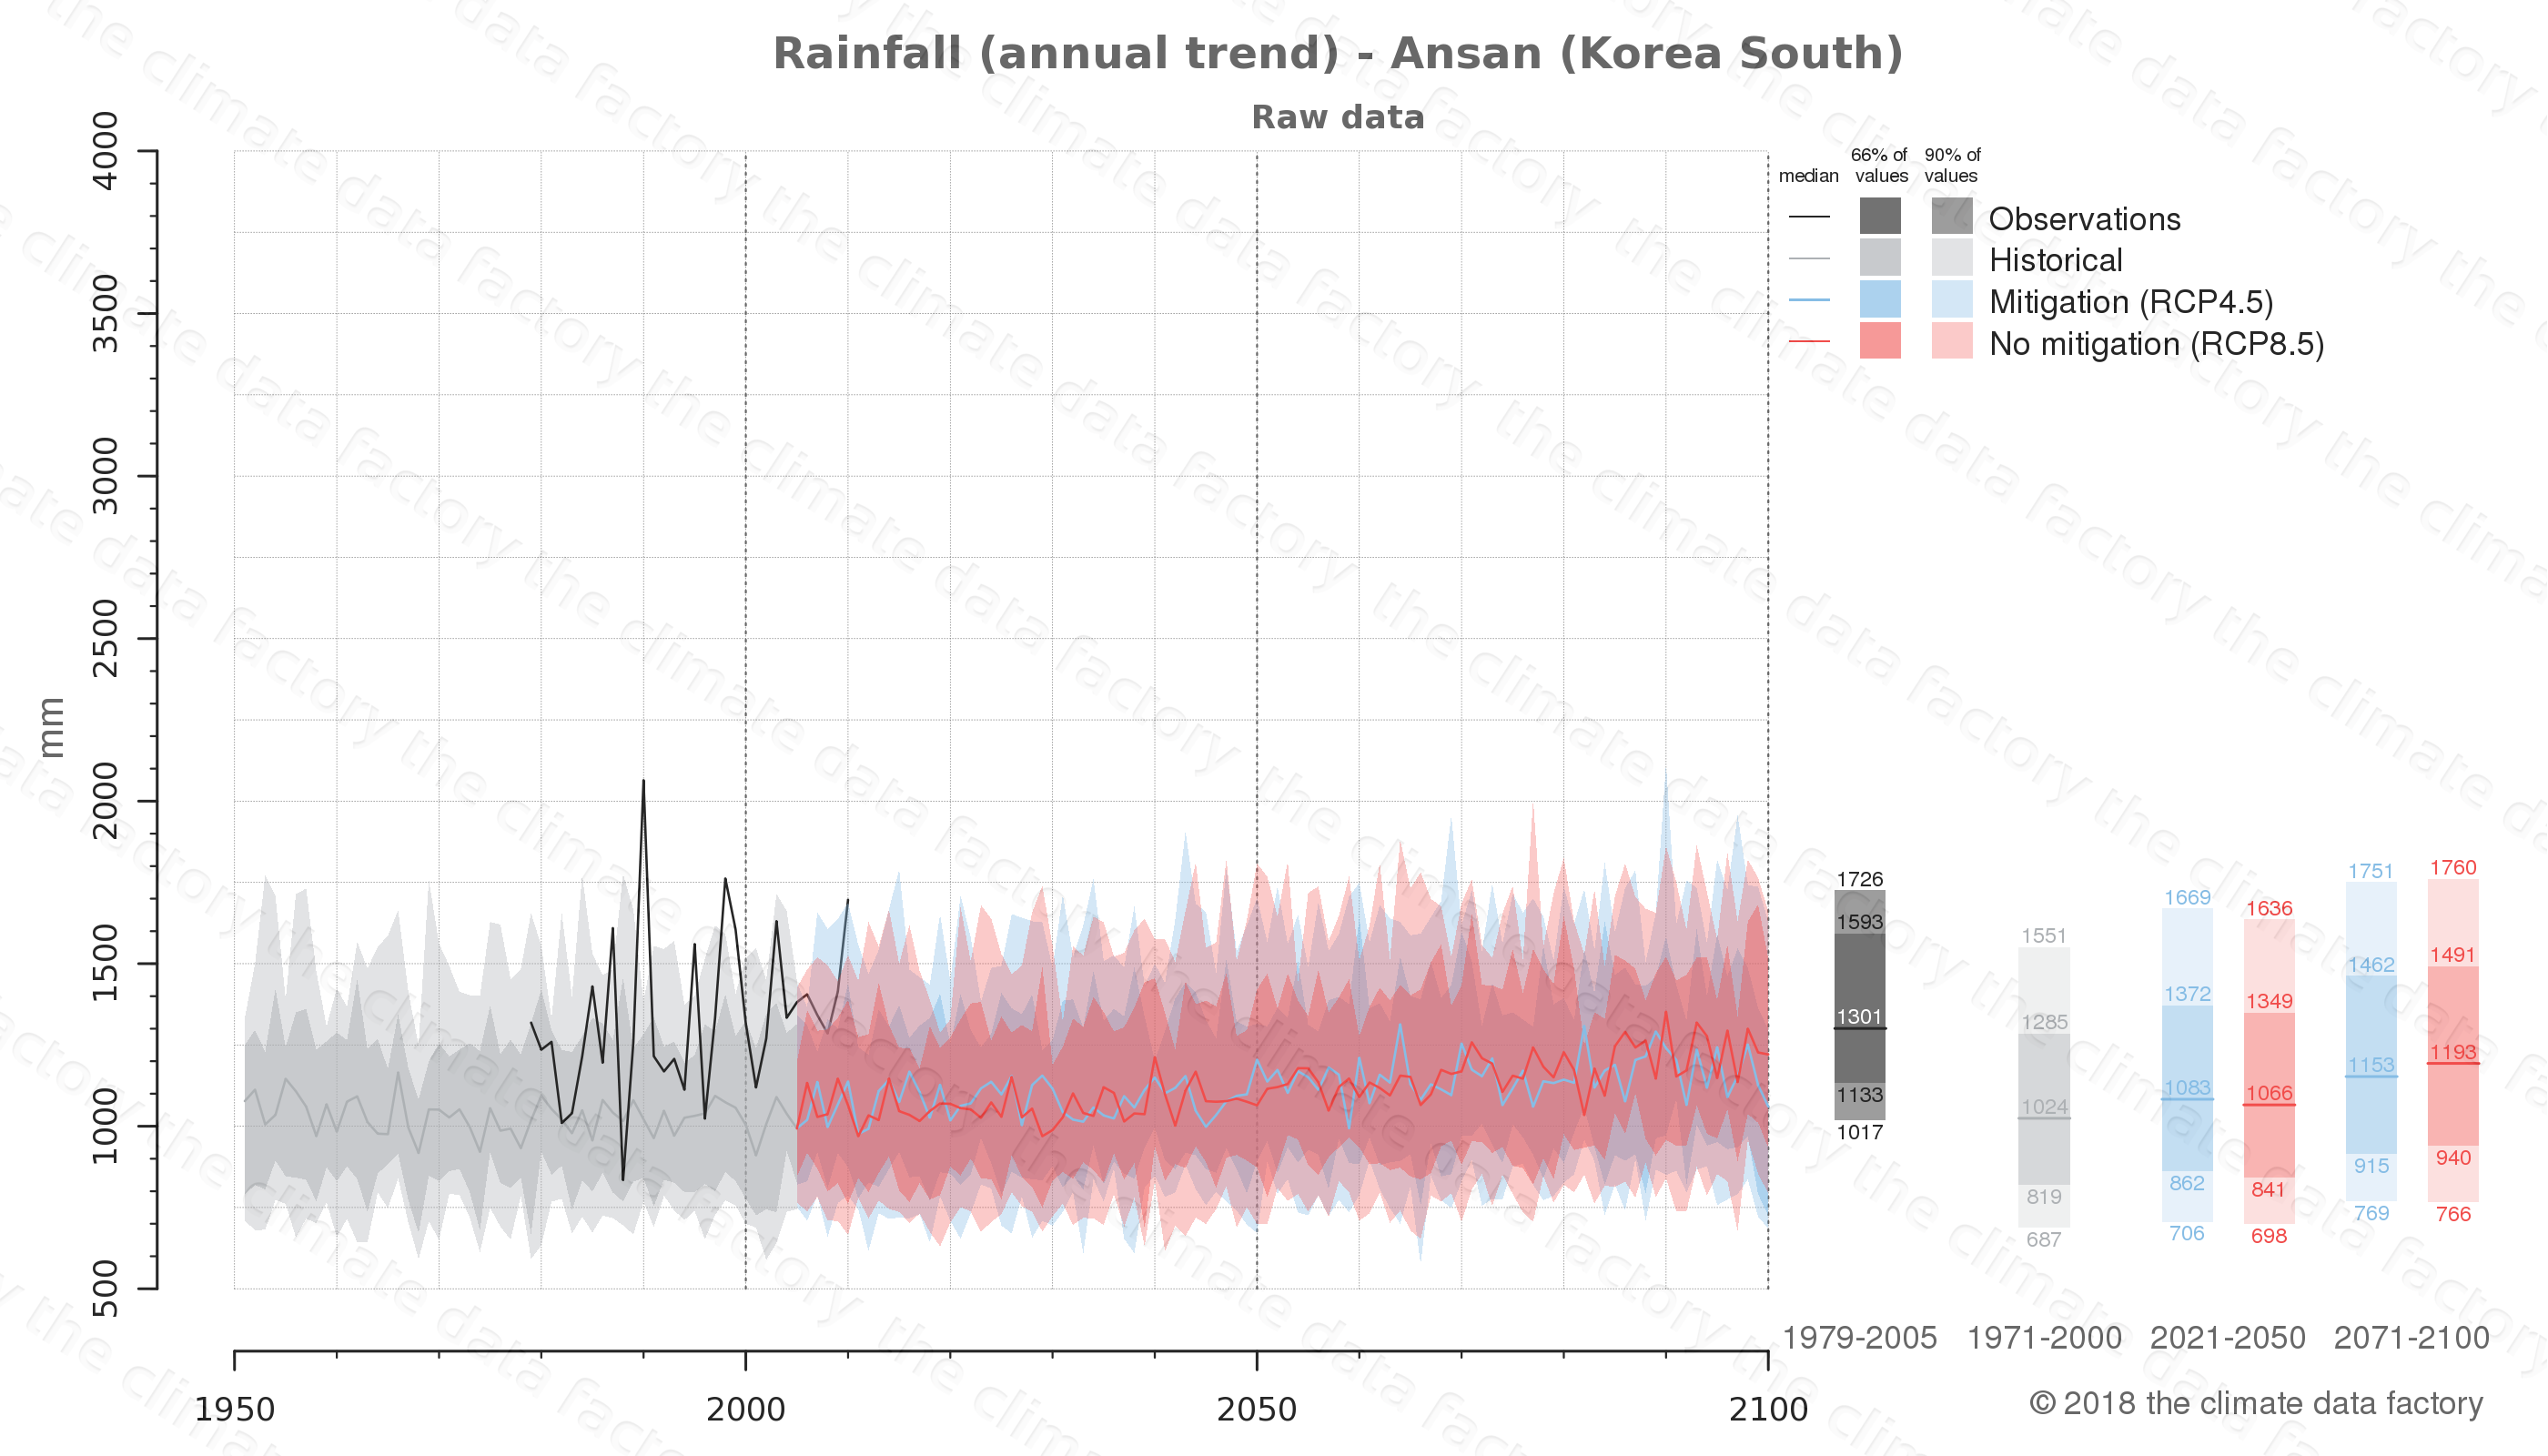 climate change data policy adaptation climate graph city data rainfall ansan south korea